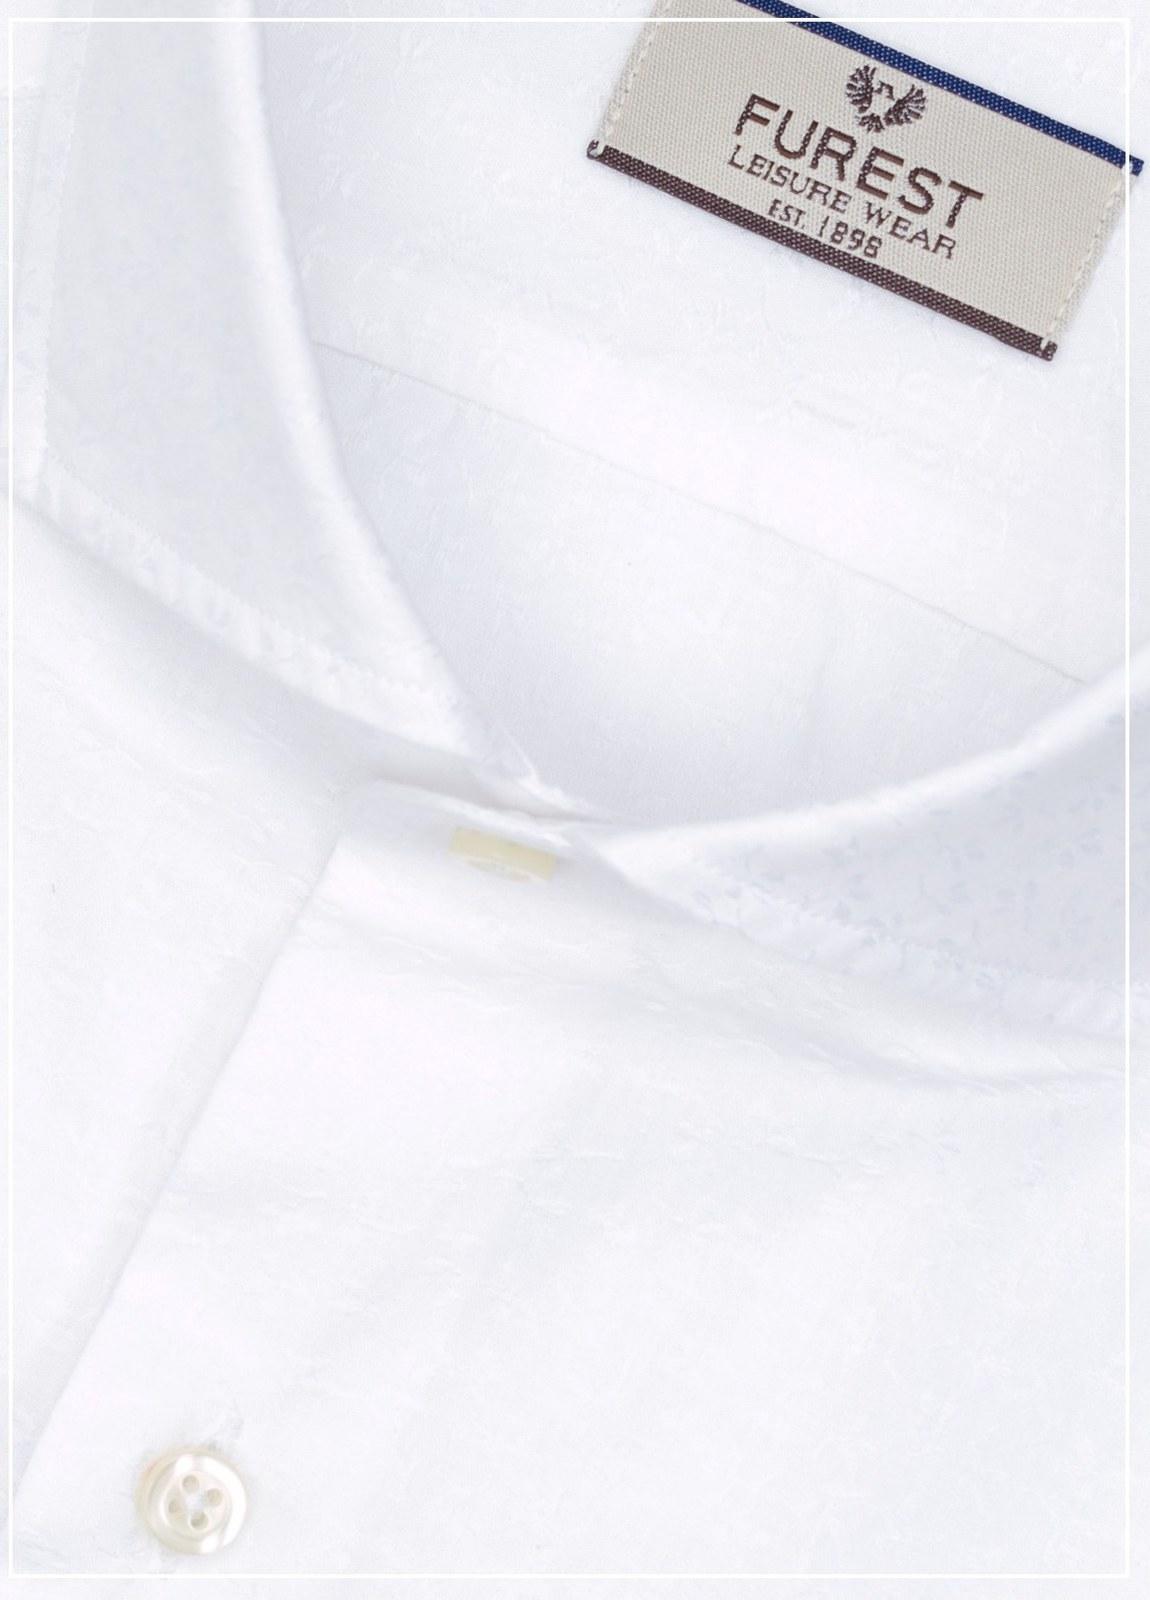 Camisa Leisure Wear SLIM FIT Modelo CAPRI diseño microdibujo color blanco,100% Algodón. - Ítem1